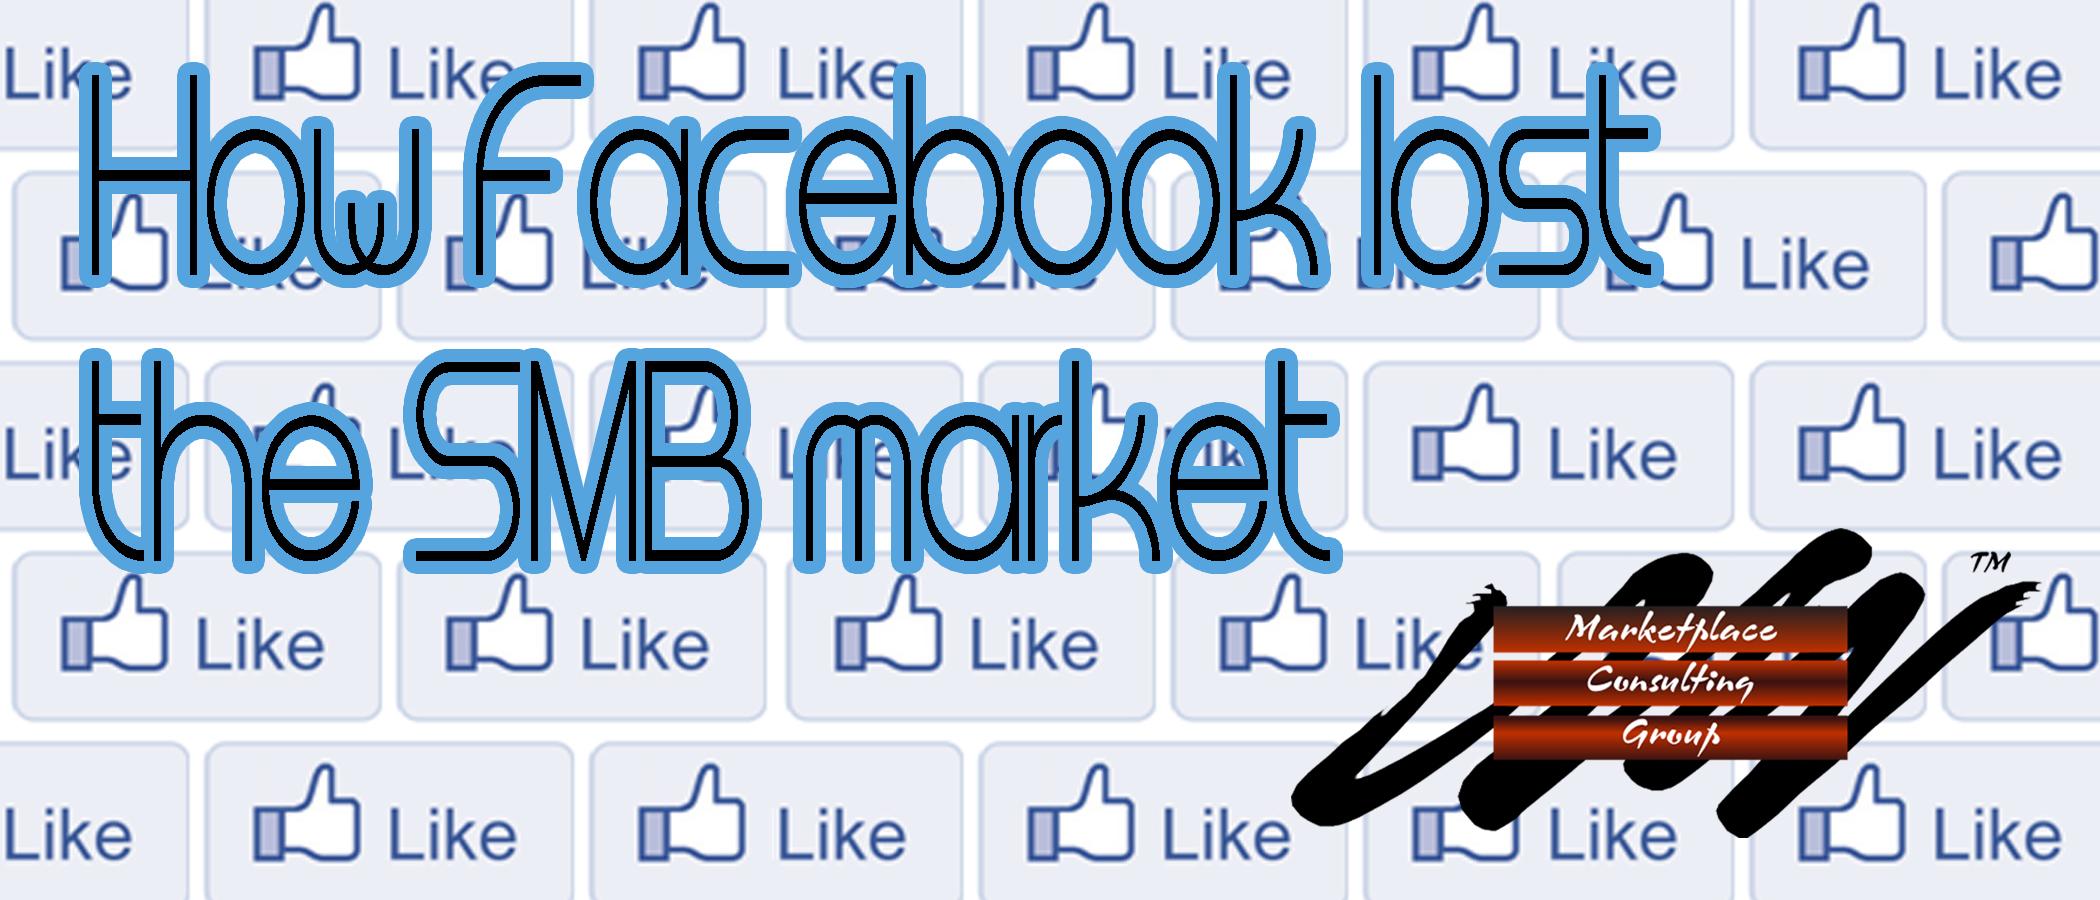 Facebook SMB marketing